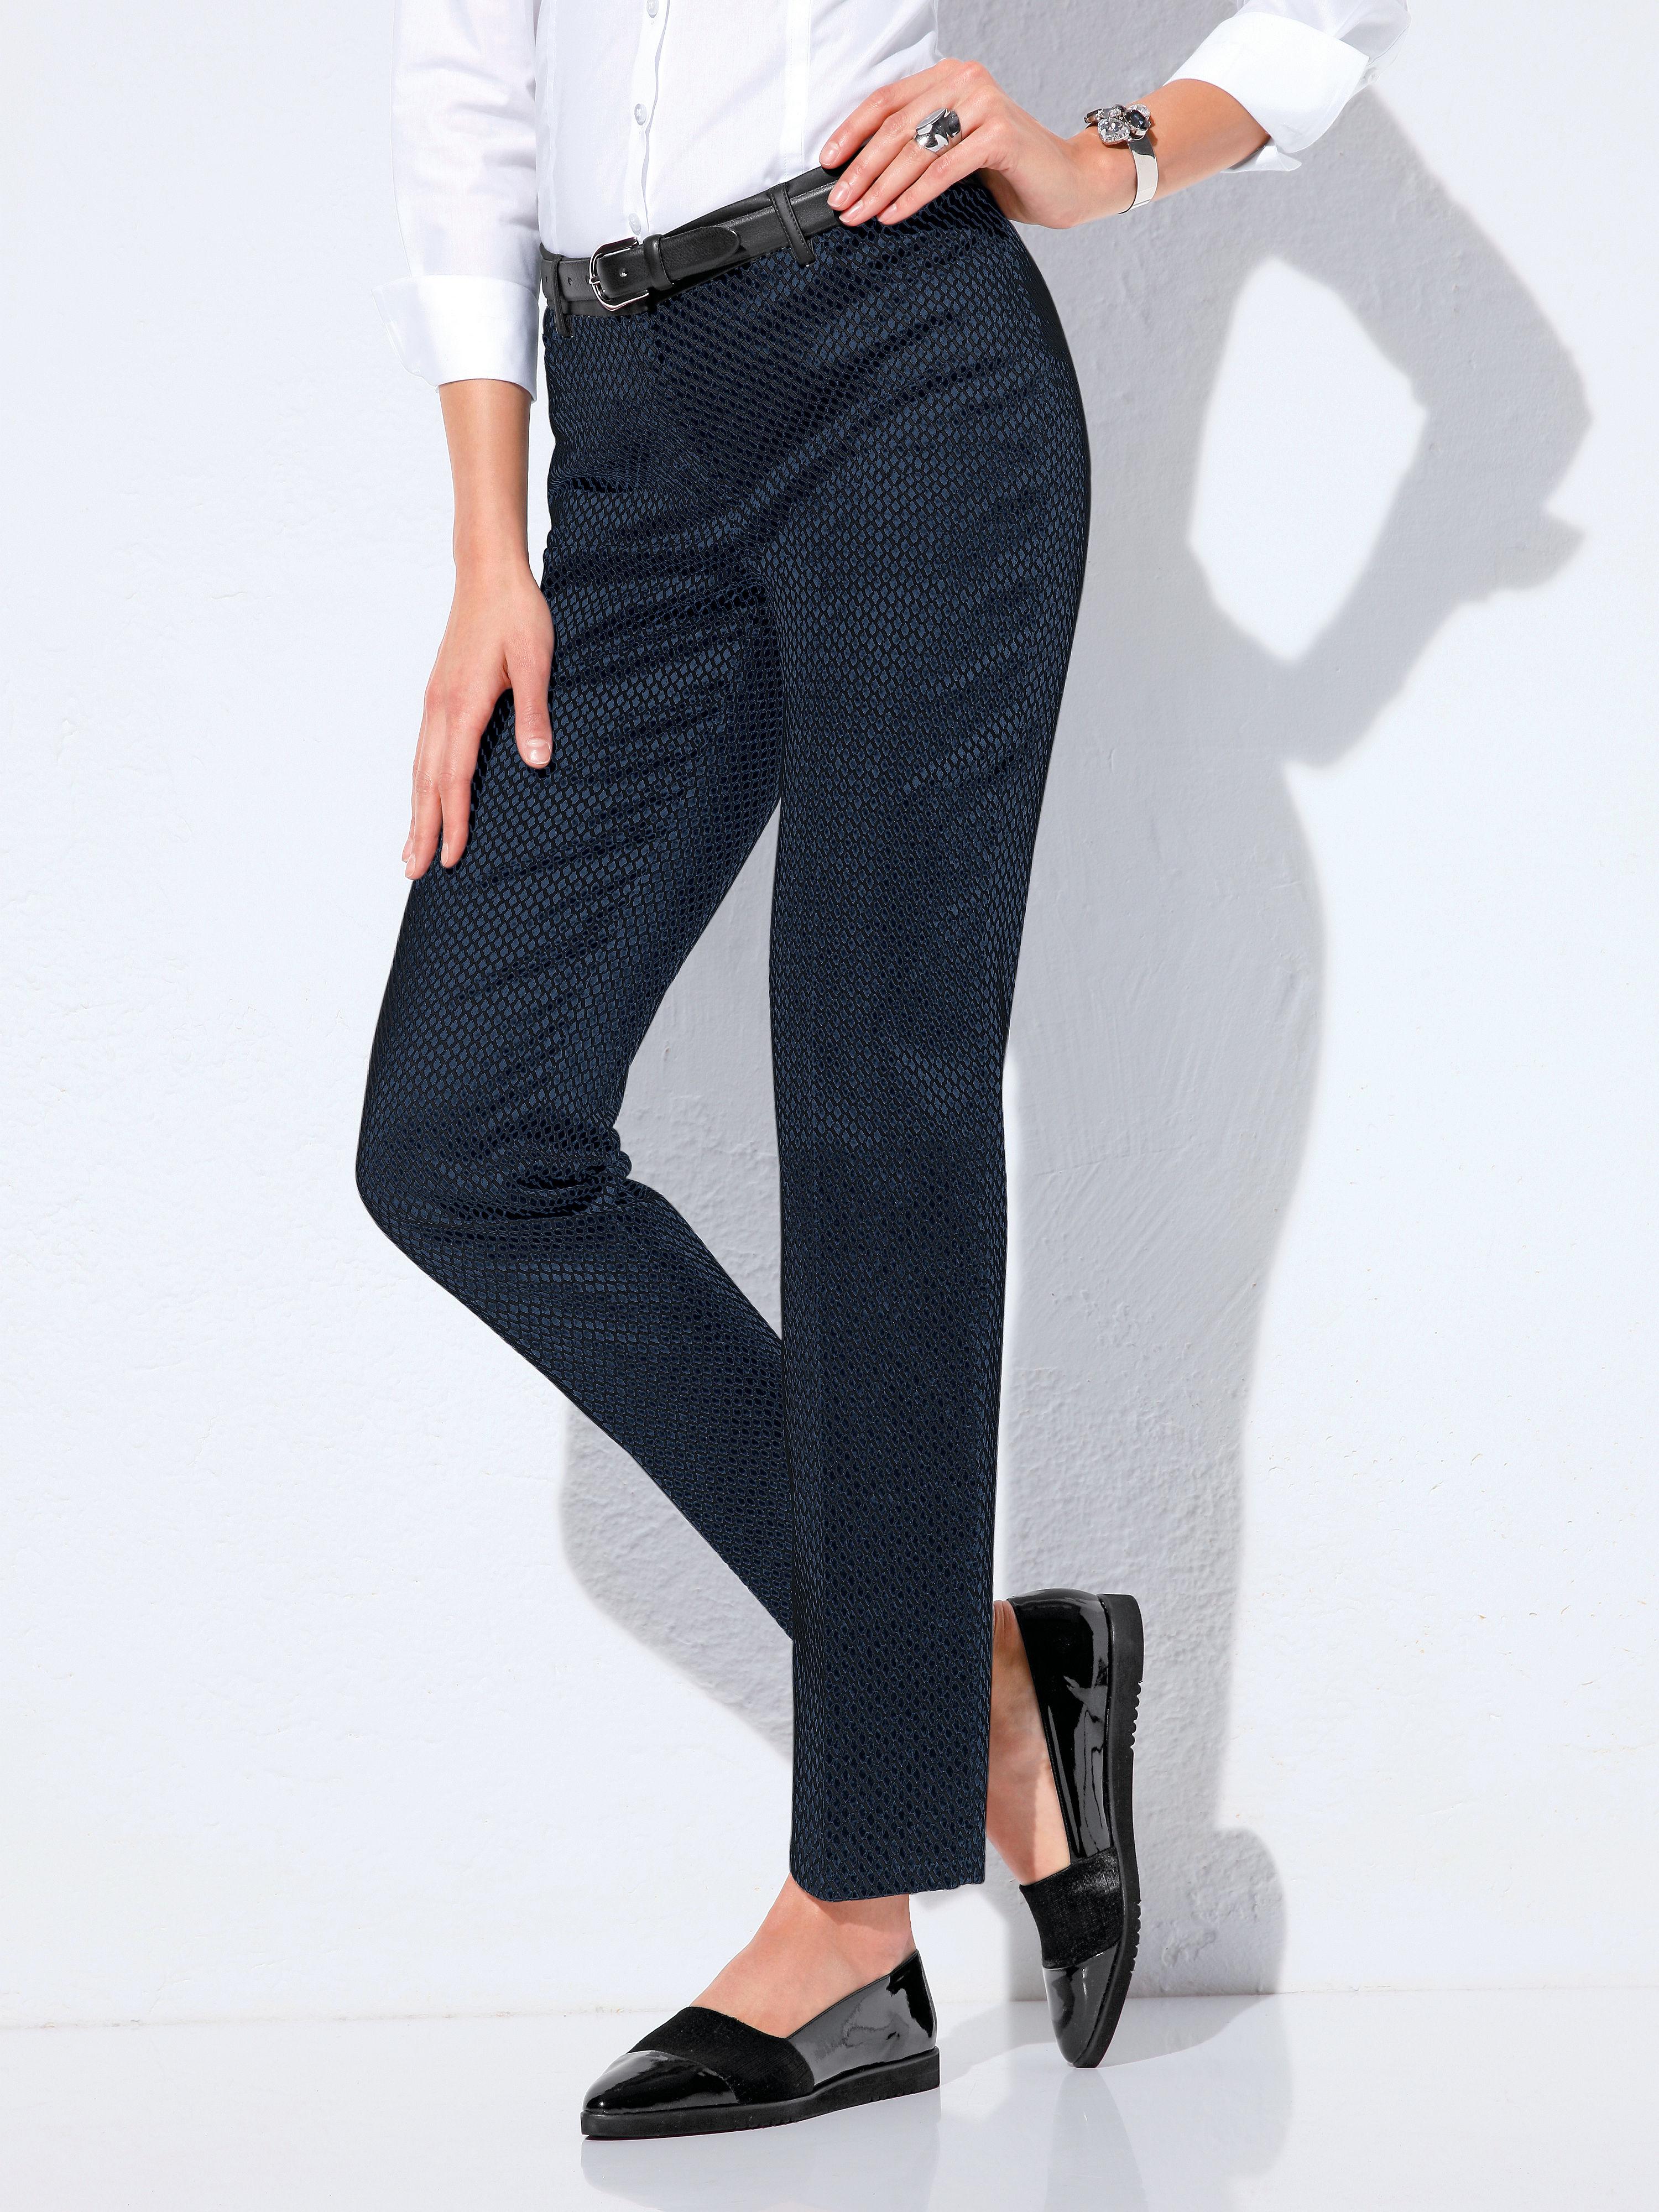 320632975a68 Hose - Modell Mandy Patch Vanilia mehrfarbig Größe  38€ 99,95€  78,95Anbieter  peterhahn.atVersand  € 5,95 -21%